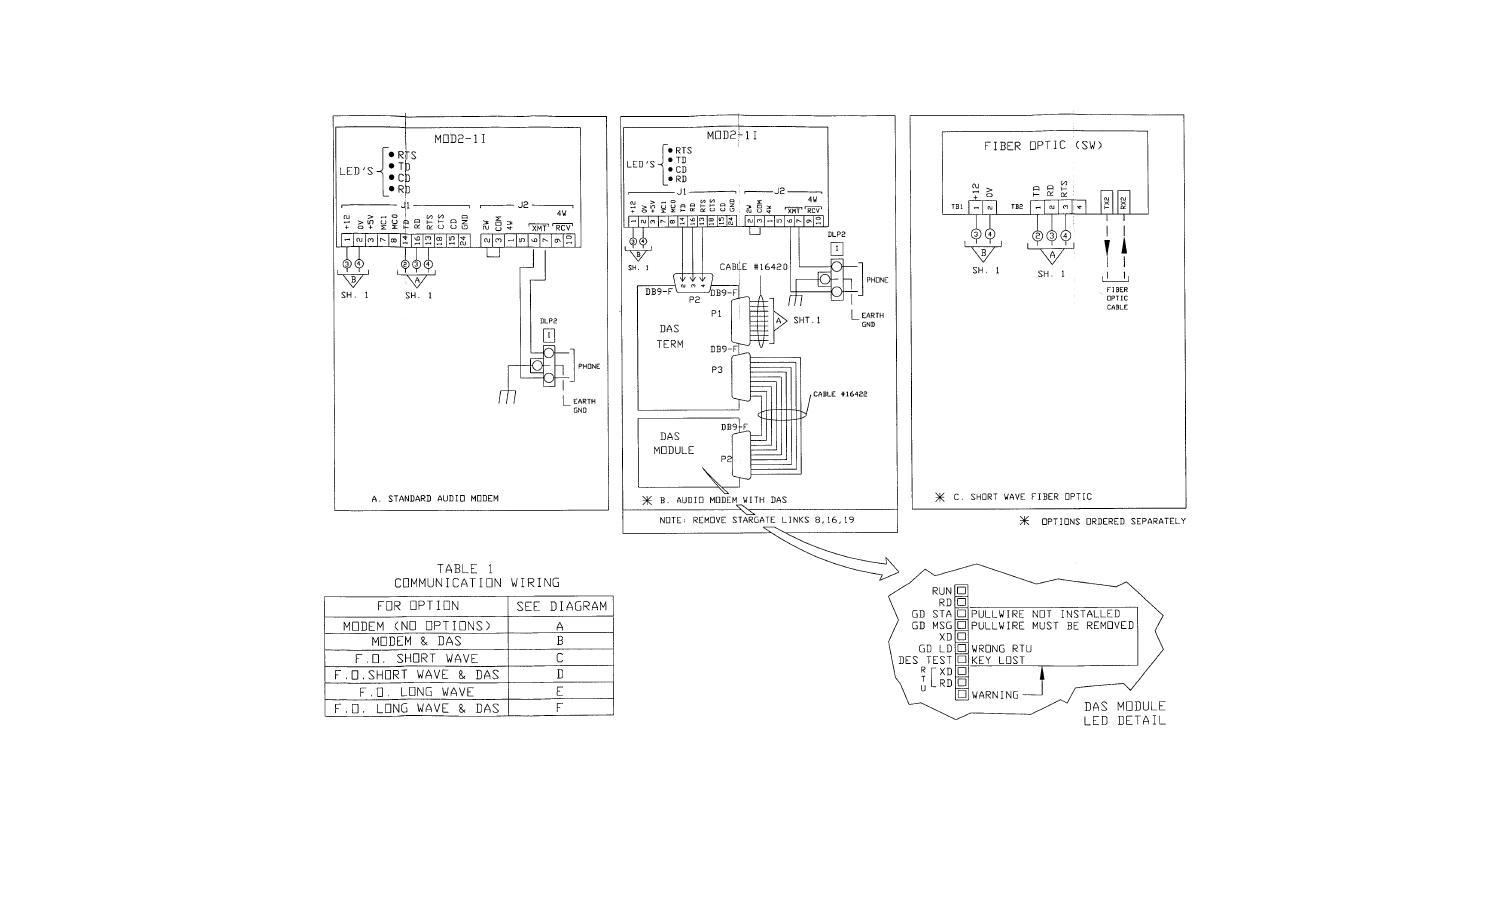 FO-5. Interior RADC, +20 vdc Functional Wiring Block